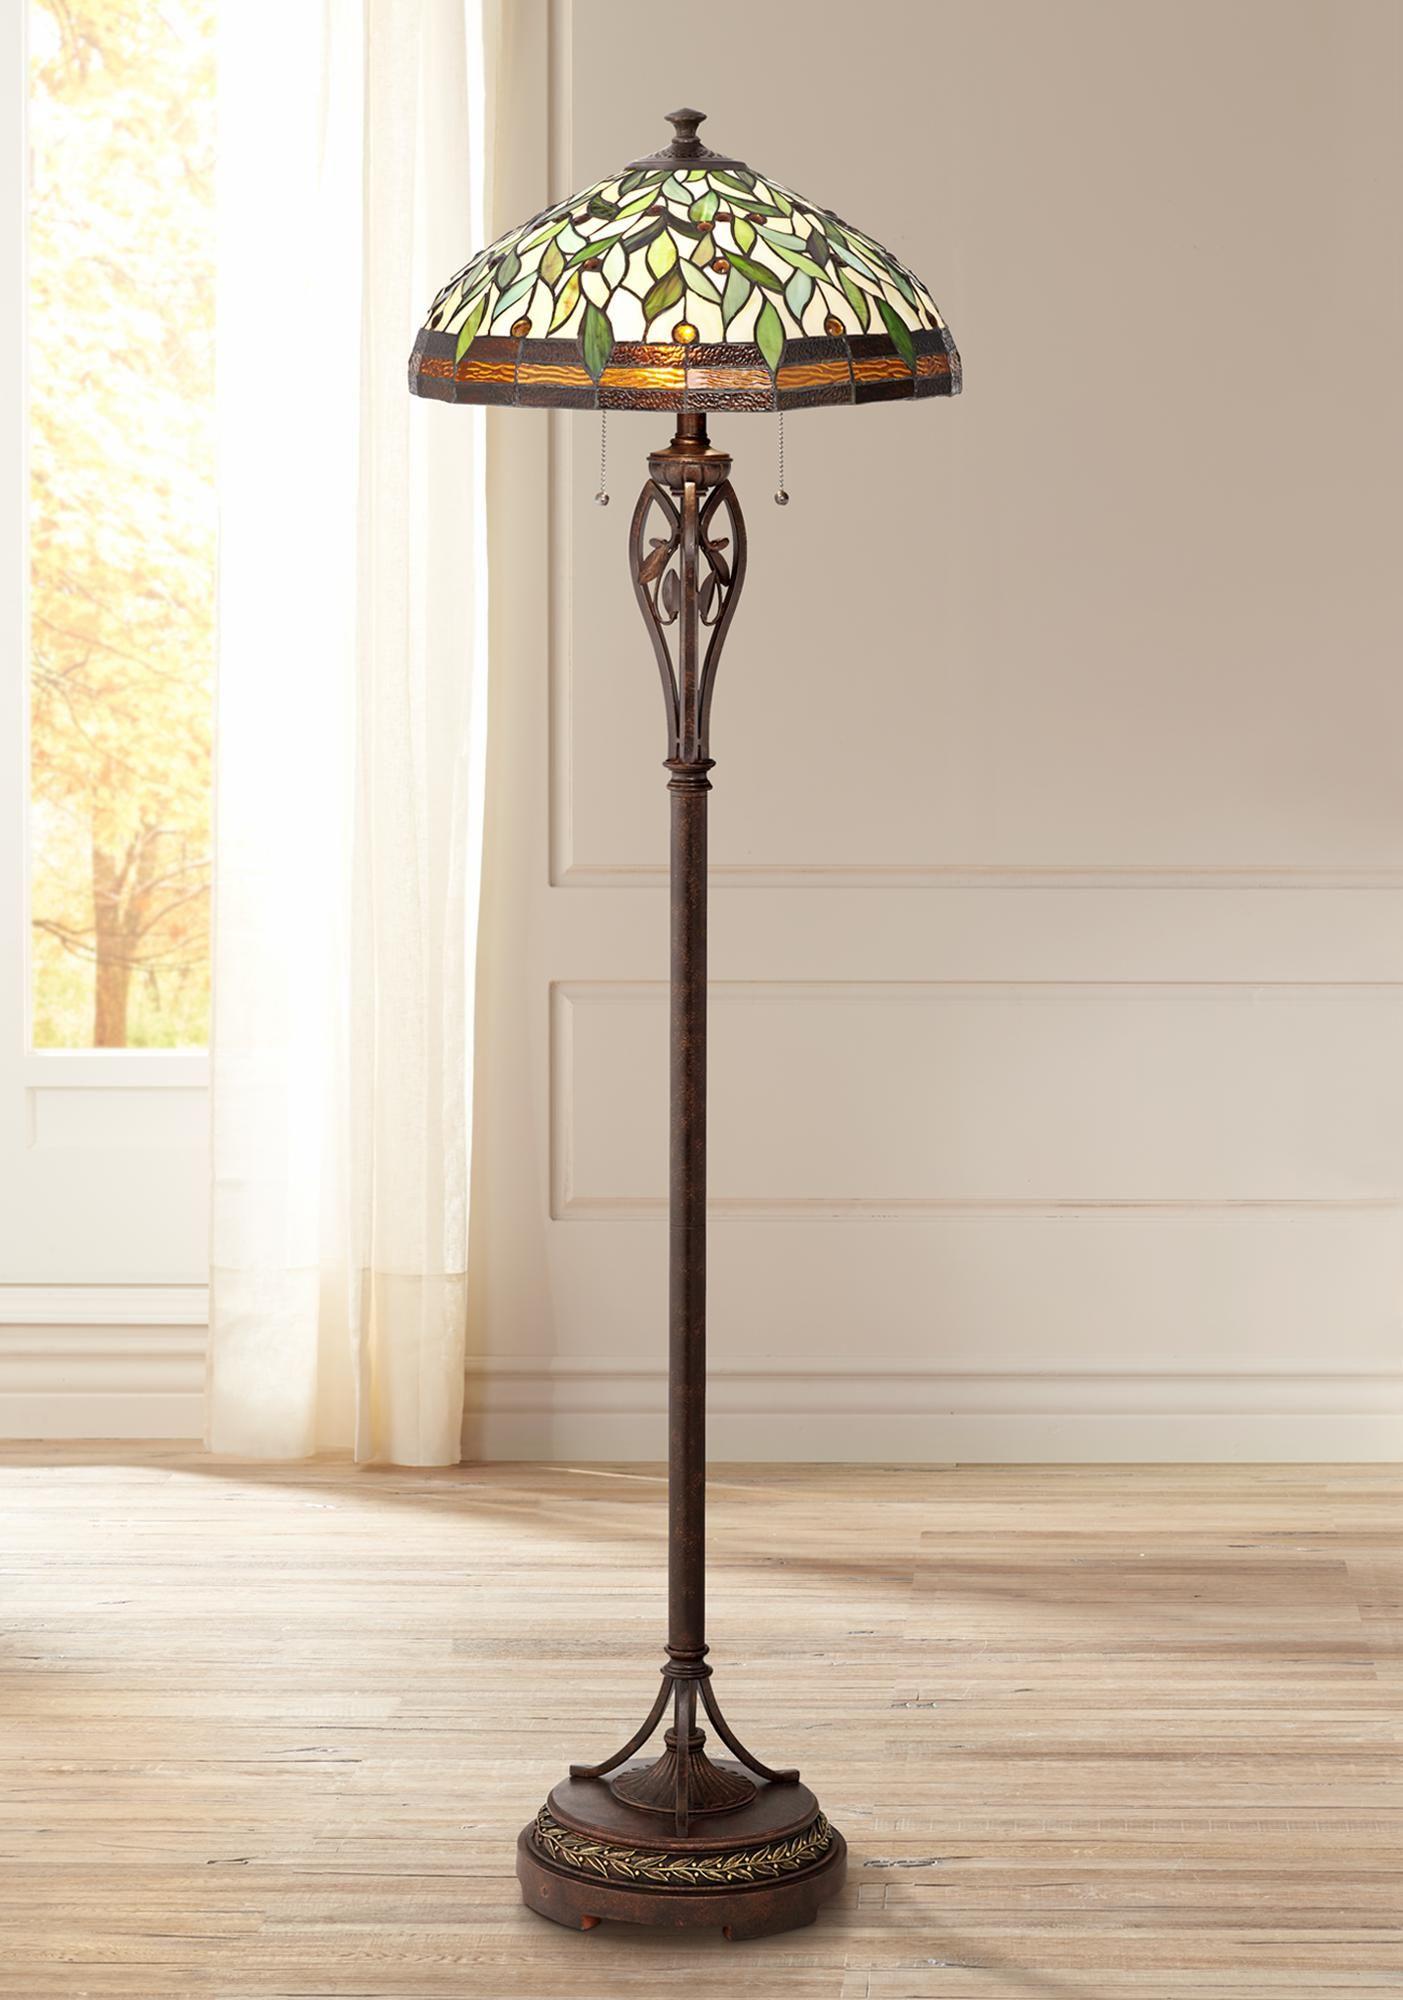 Floor Lamps Leaf And Vine Ii Tiffany Style Floor Lamp Tiffany Style Floor Lamps Stained Glass Floor Lamp Bronze Floor Lamp